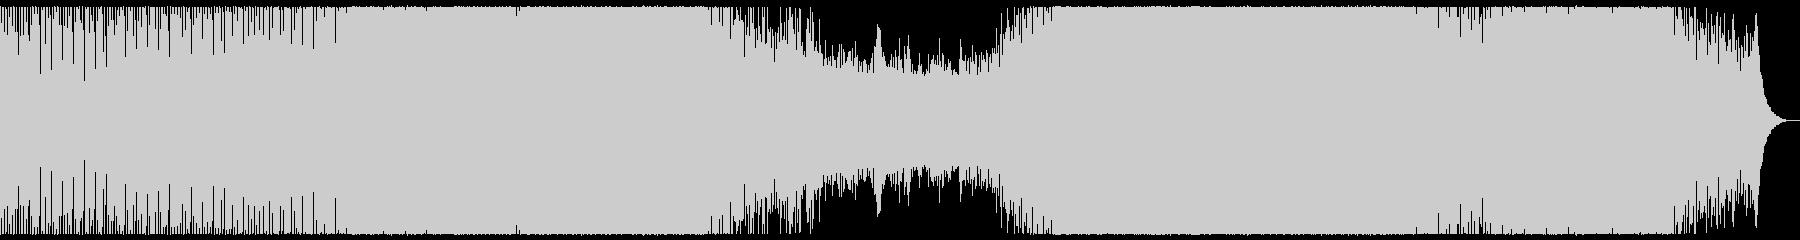 Progressive house with quiet excitement.'s unreproduced waveform